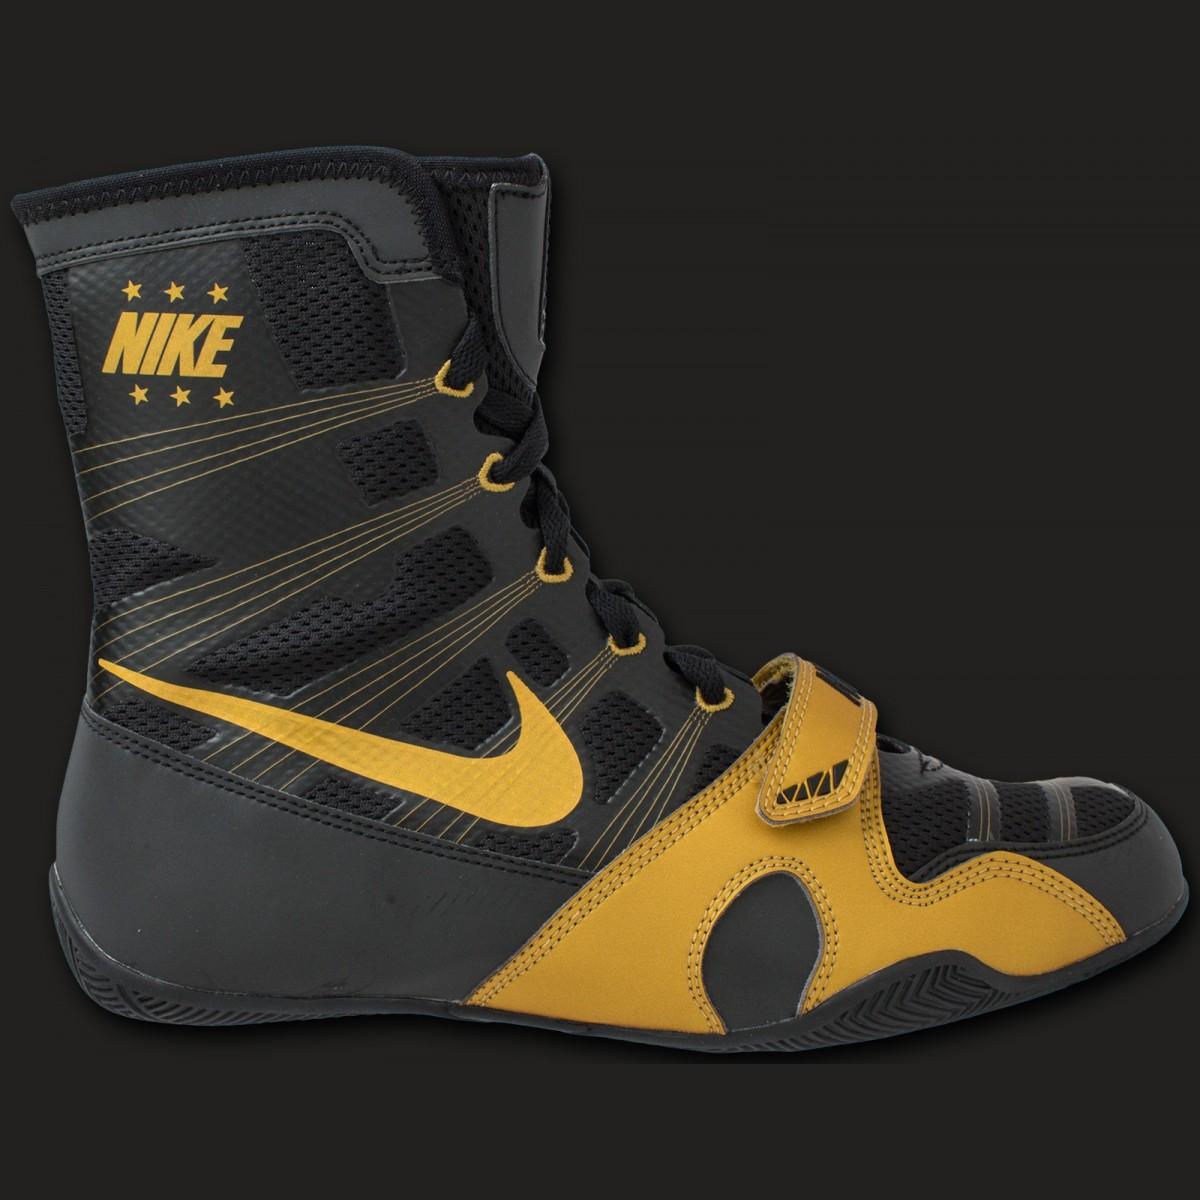 Nike HyperKO boxingboot Black/ metallic gold